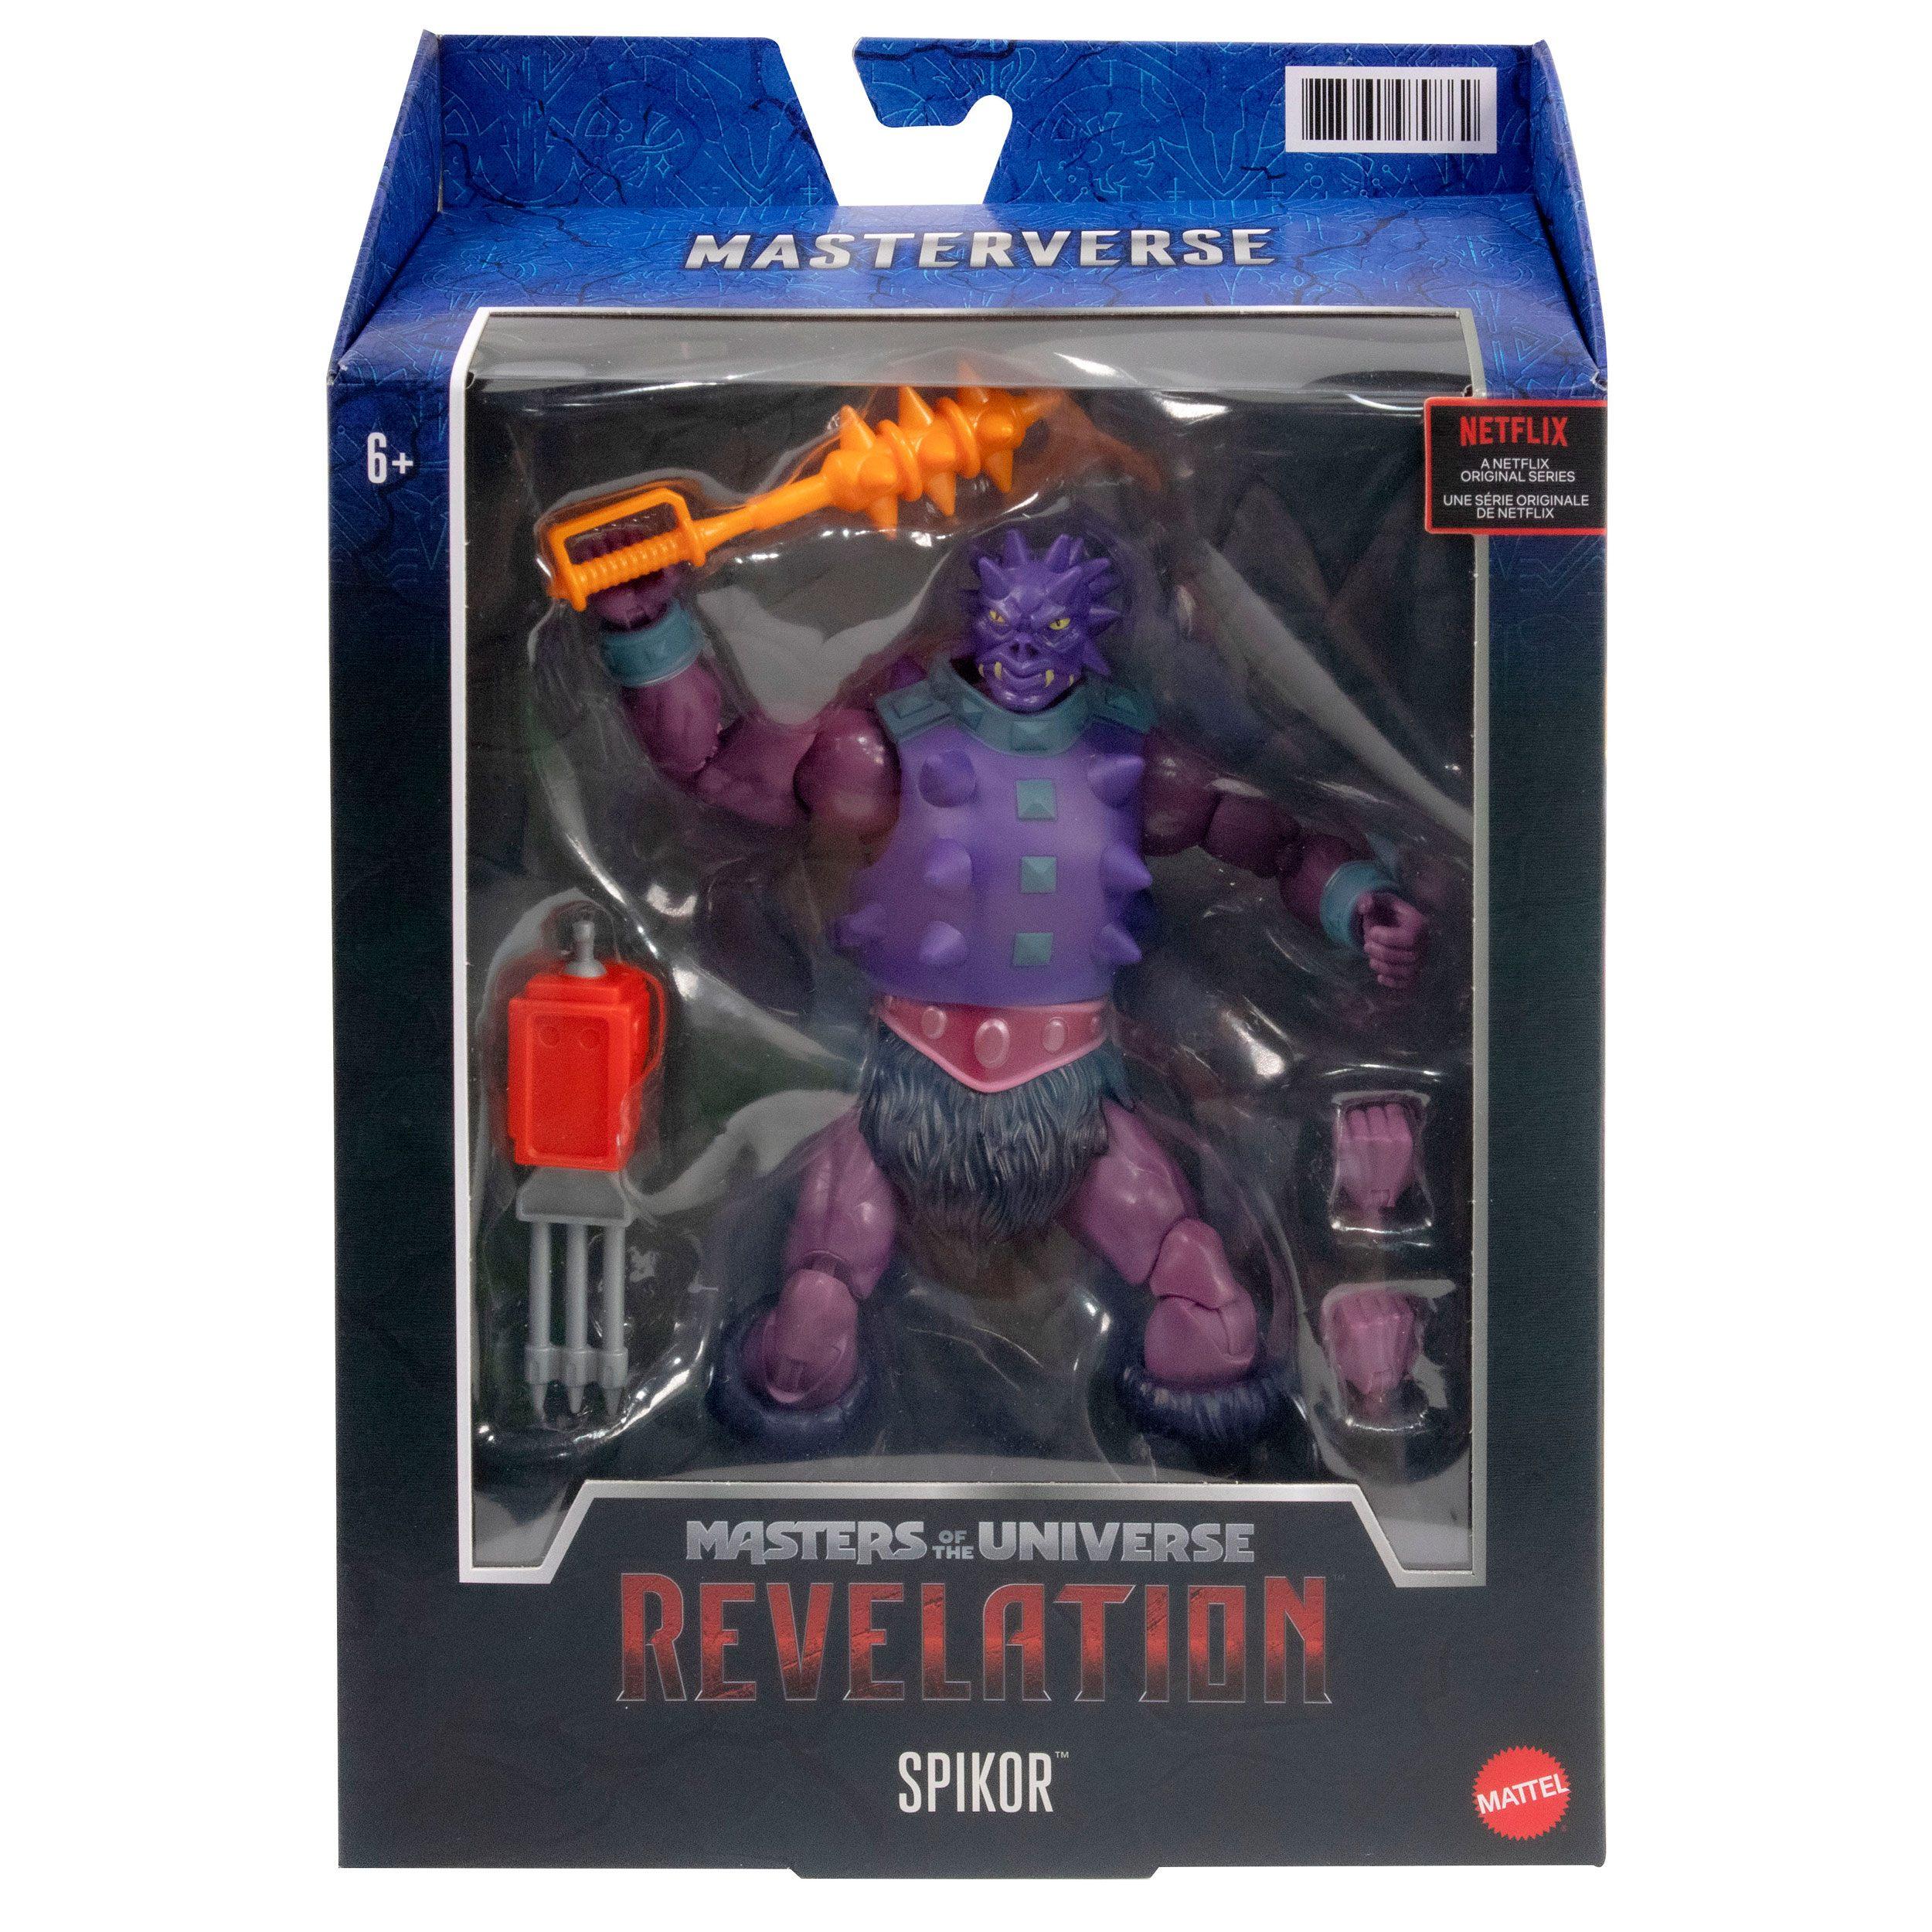 Masters of the Universe: Revelation Masterverse Actionfigur 2021 Spikor 18 cm MATTGYV14 0887961979862